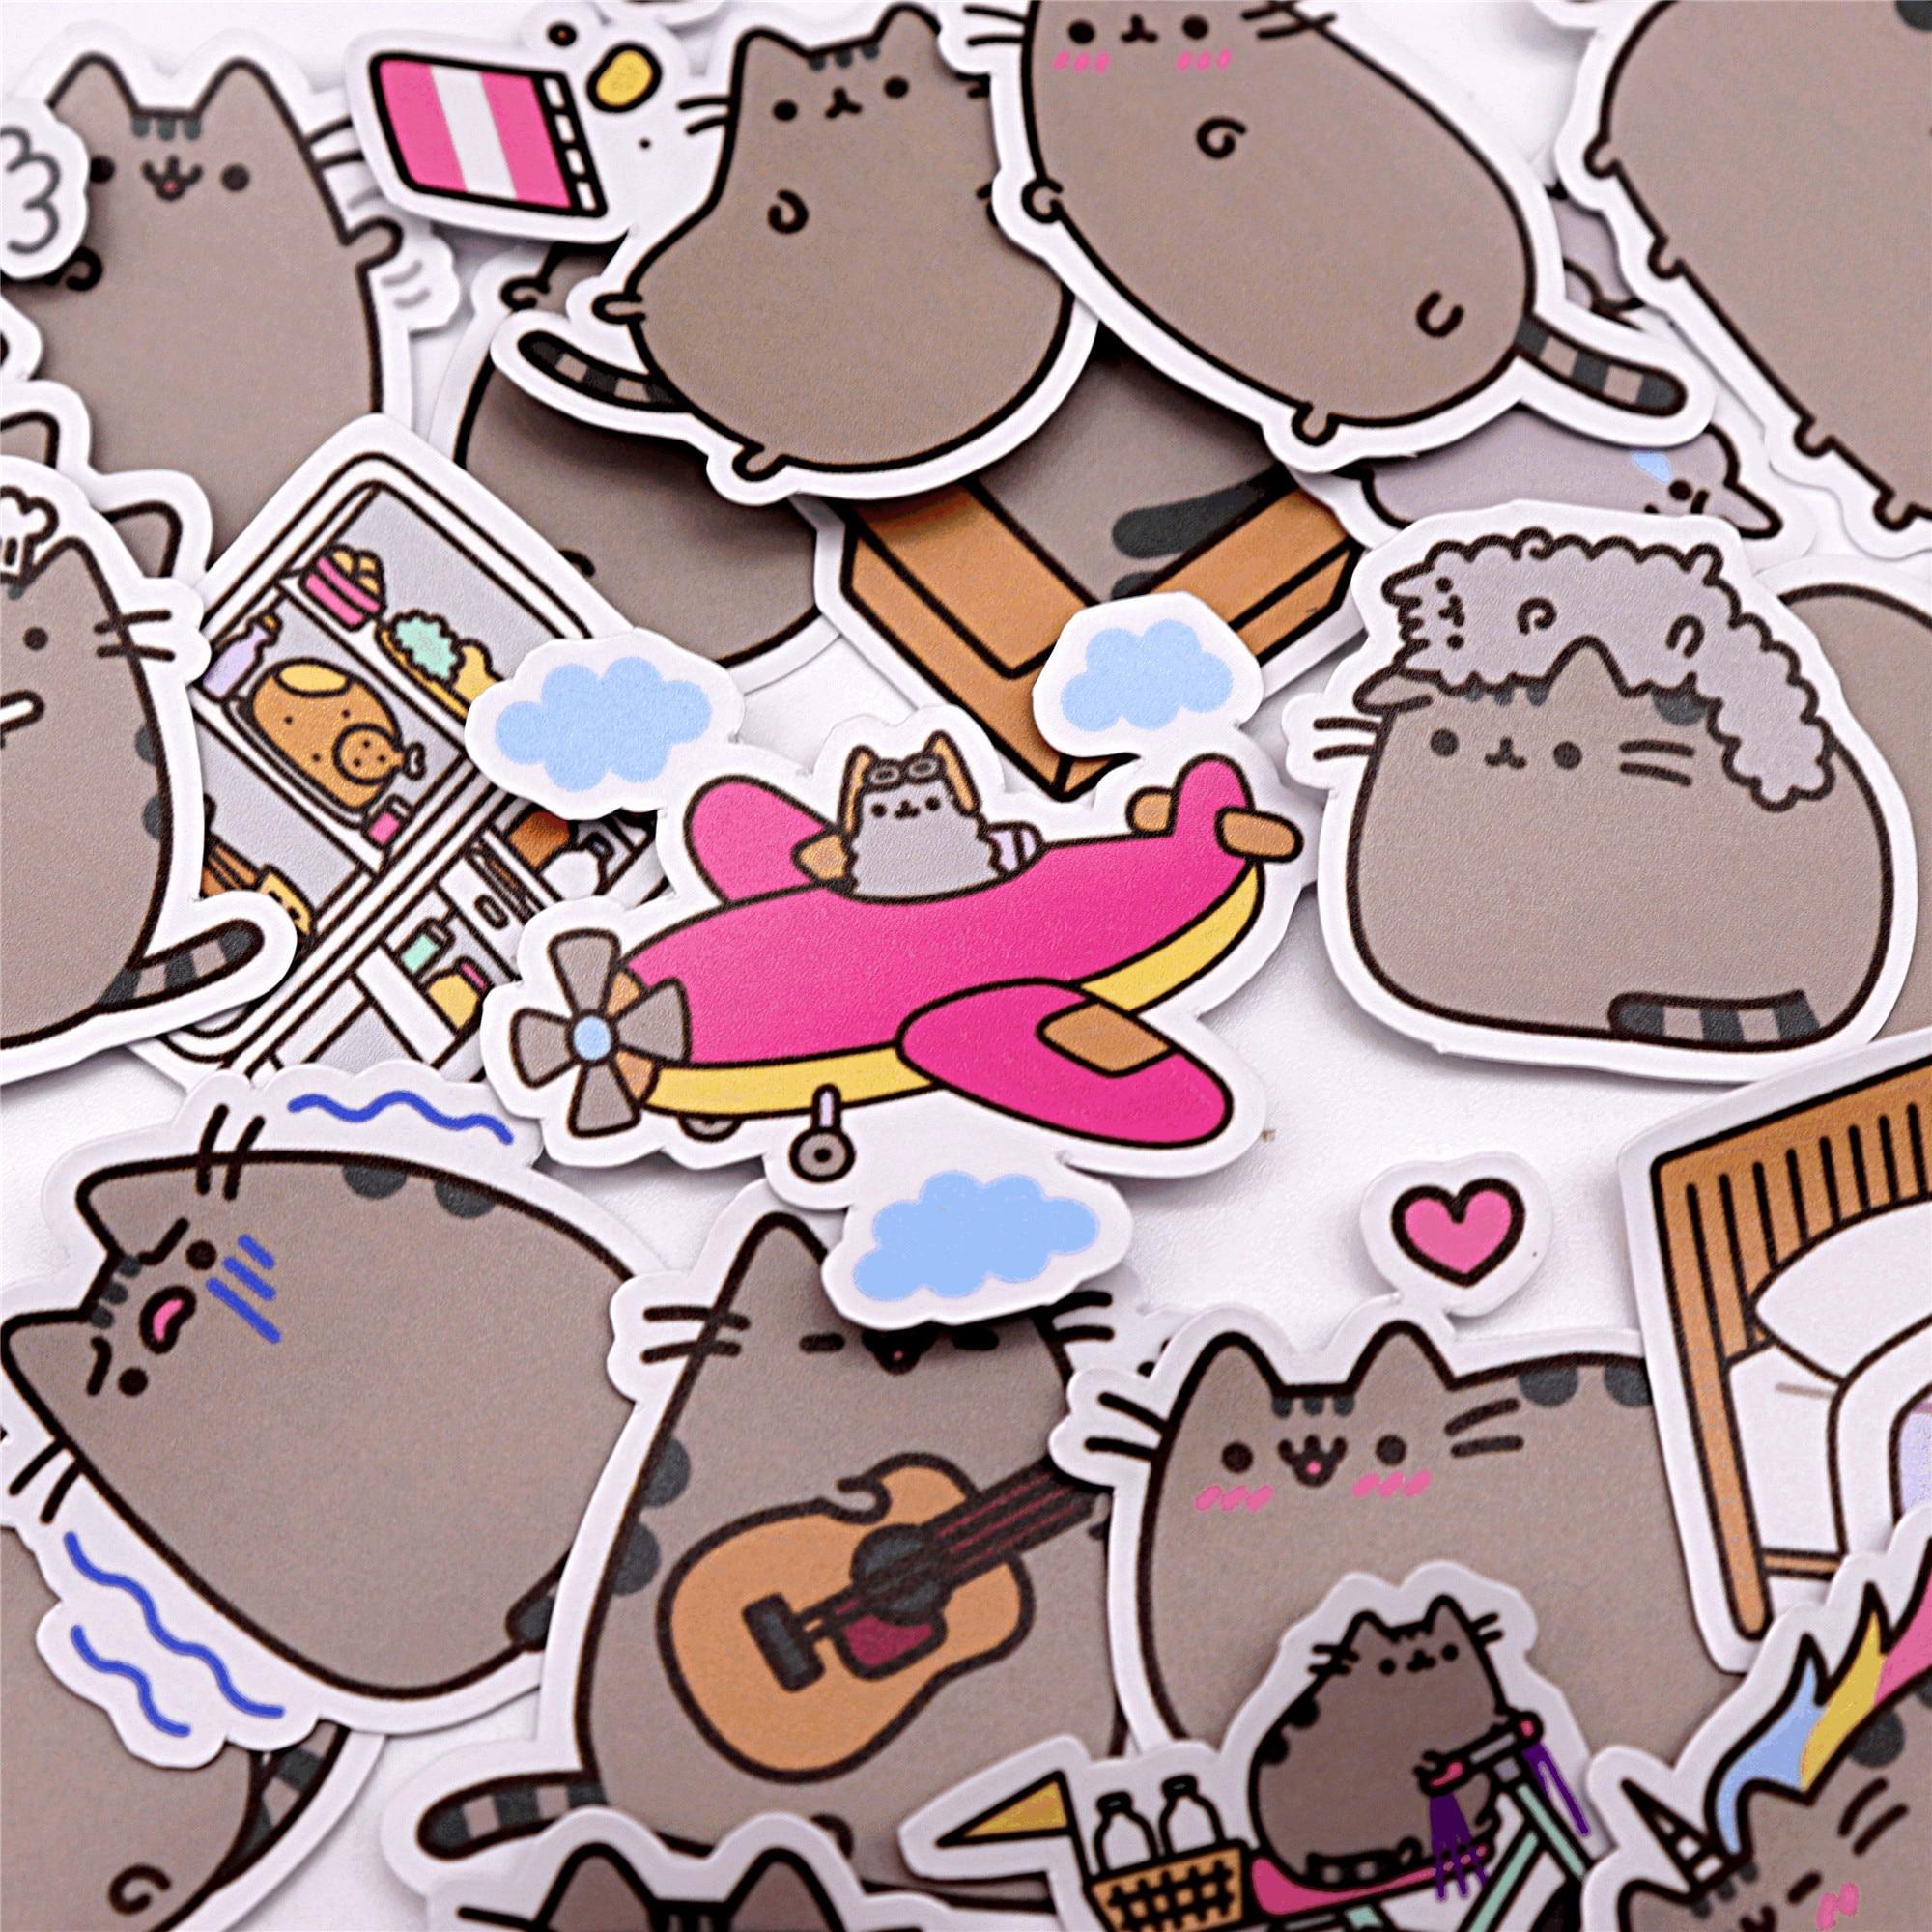 39pcs Creative Cute Self-made Fat Cat Sticker Scrapbooking Stickers /decorative Sticker /DIY Craft Photo Albums Waterproof